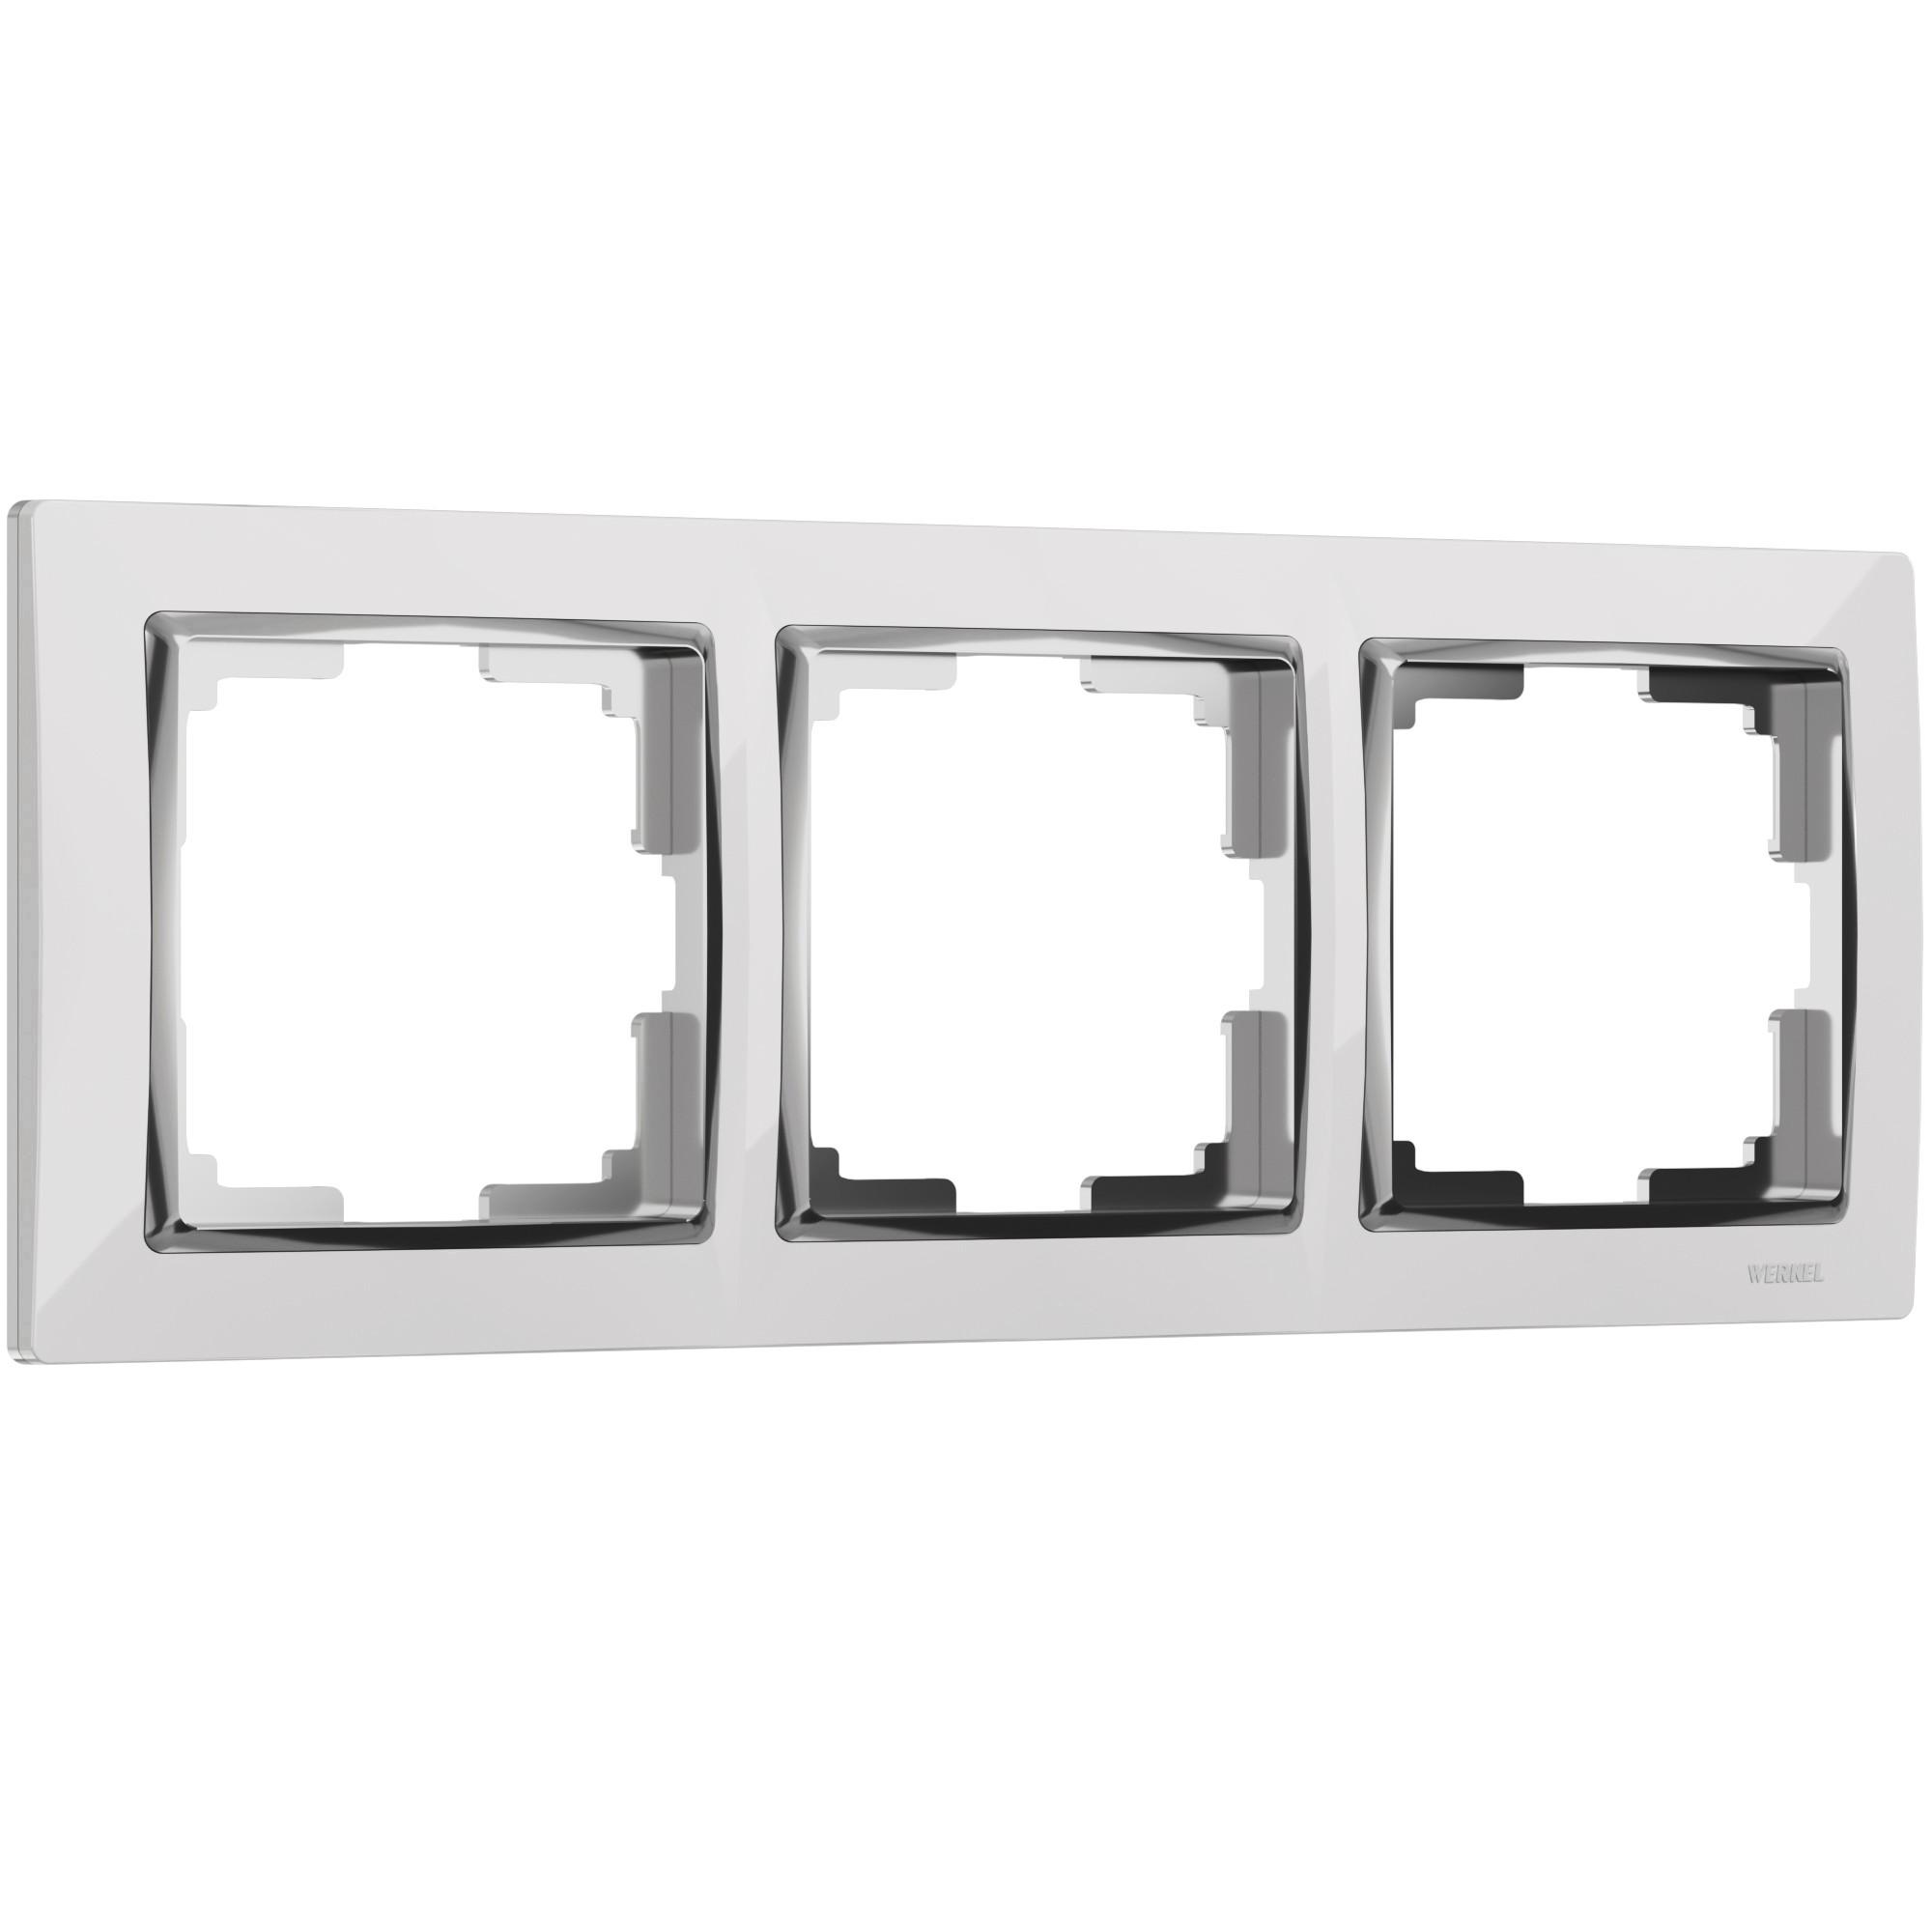 WL03-Frame-03-white /Рамка на 3 поста (белый/хром)